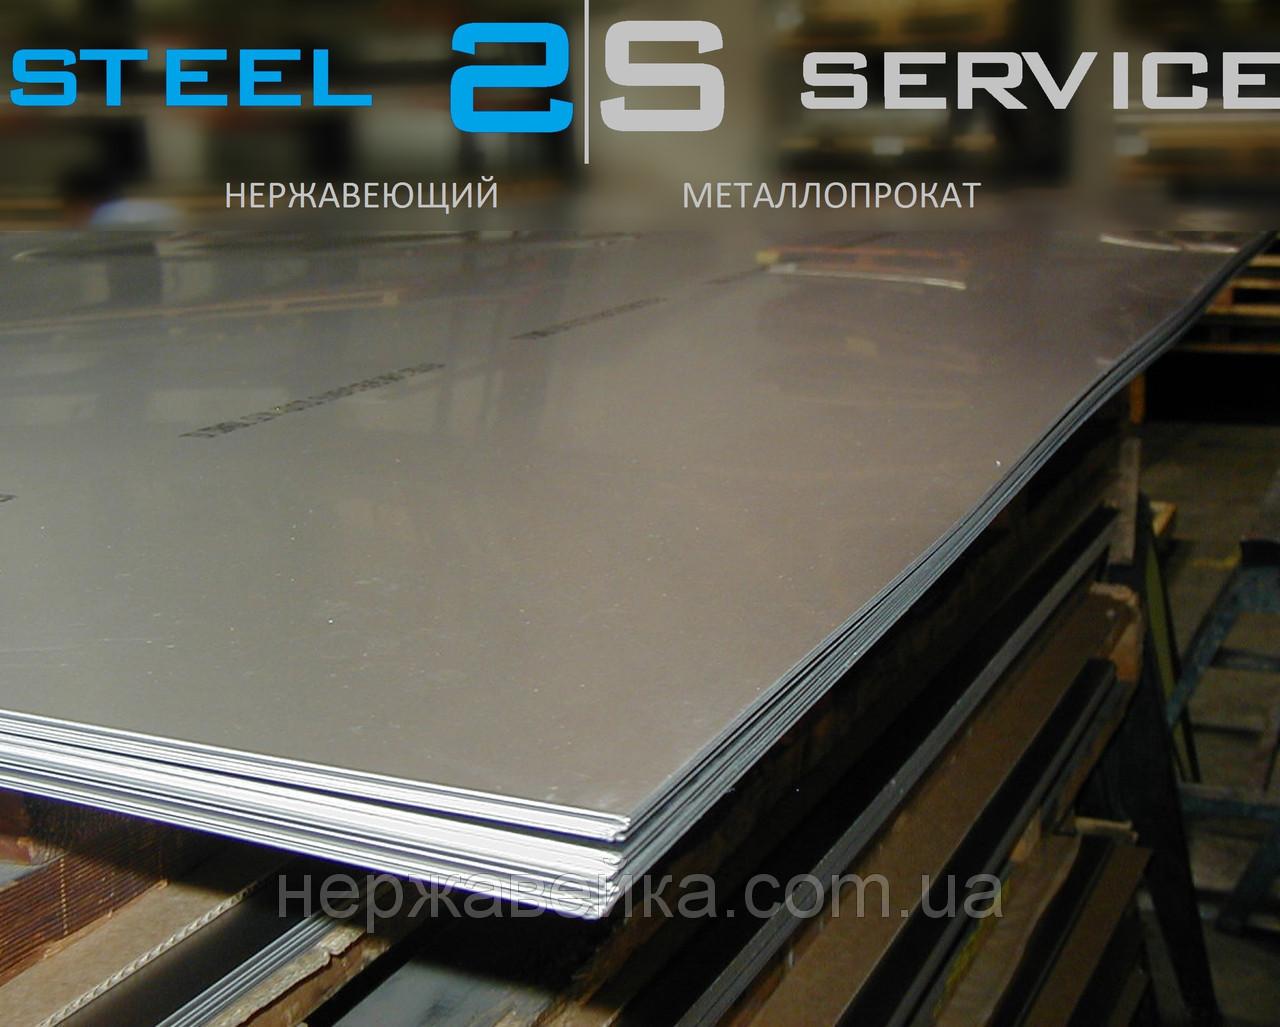 Нержавеющий лист 1х1250х2500мм  AISI 316L(03Х17Н14М3) 2B - матовый,  кислотостойкий